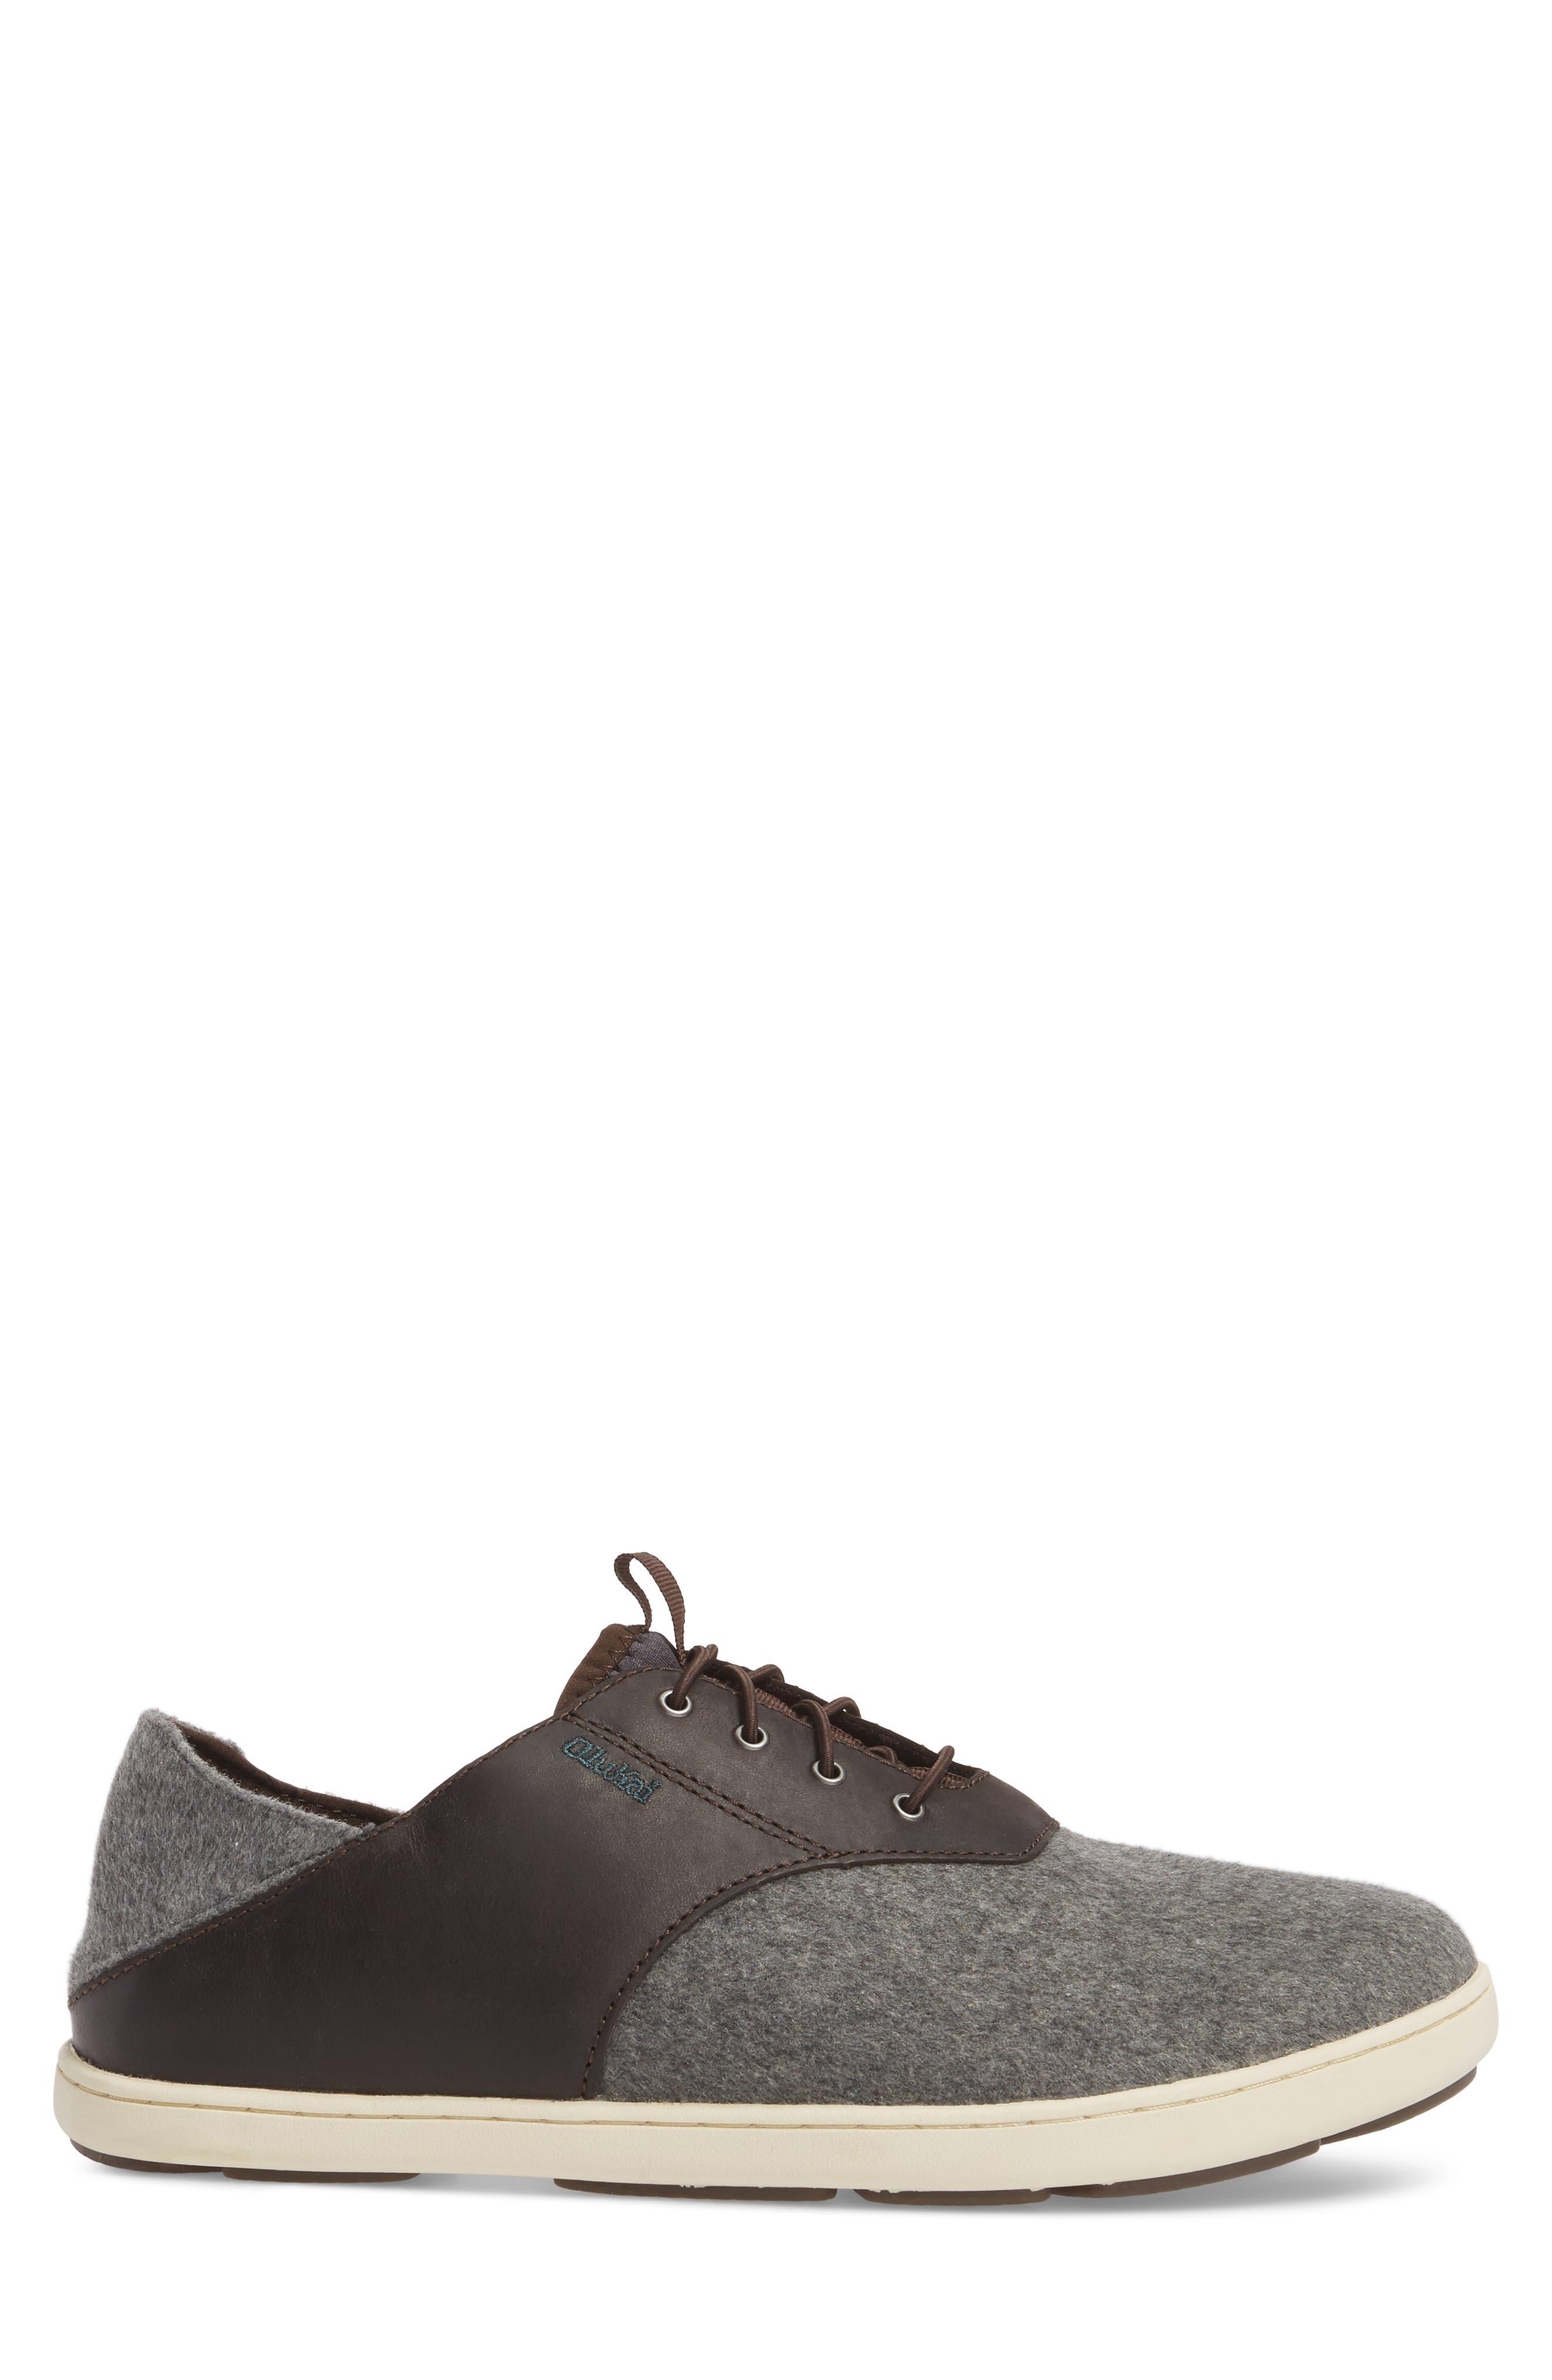 Nohea Moku Hulu Sneaker,                             Alternate thumbnail 3, color,                             Dark Roast/ Charcoal Wool